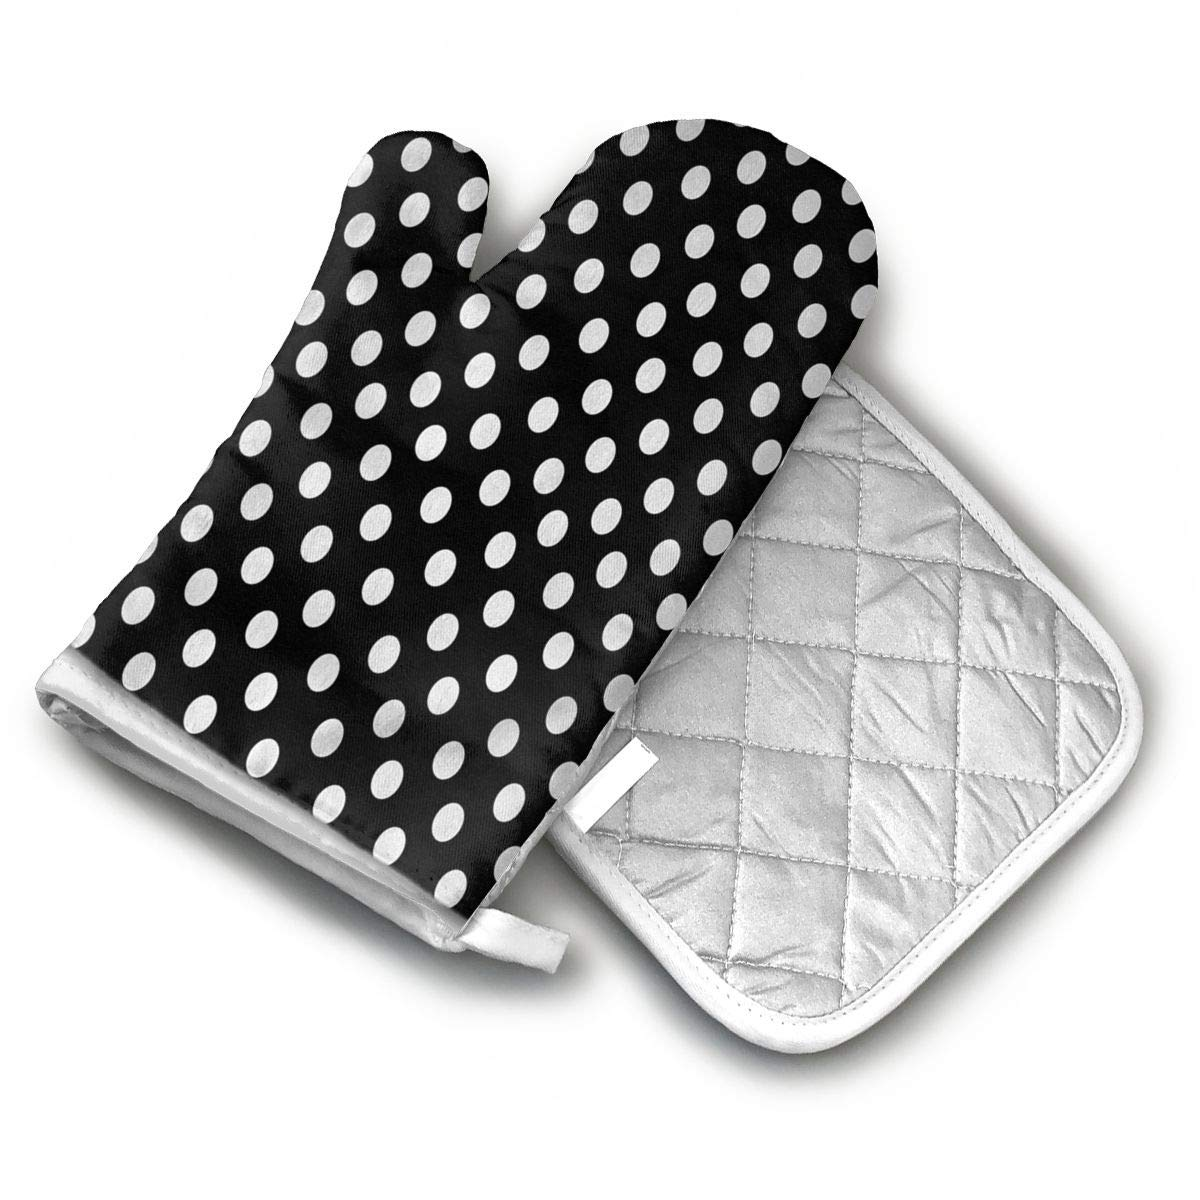 AISDHAJKSD Polka Dot Designs White Polka Dots On Classy Black Premium Terylene/Nylon Oven Mitts and Pot Mat,Pot Mat/Hot Pads, Heat Resistant Gloves BBQ Kitchen